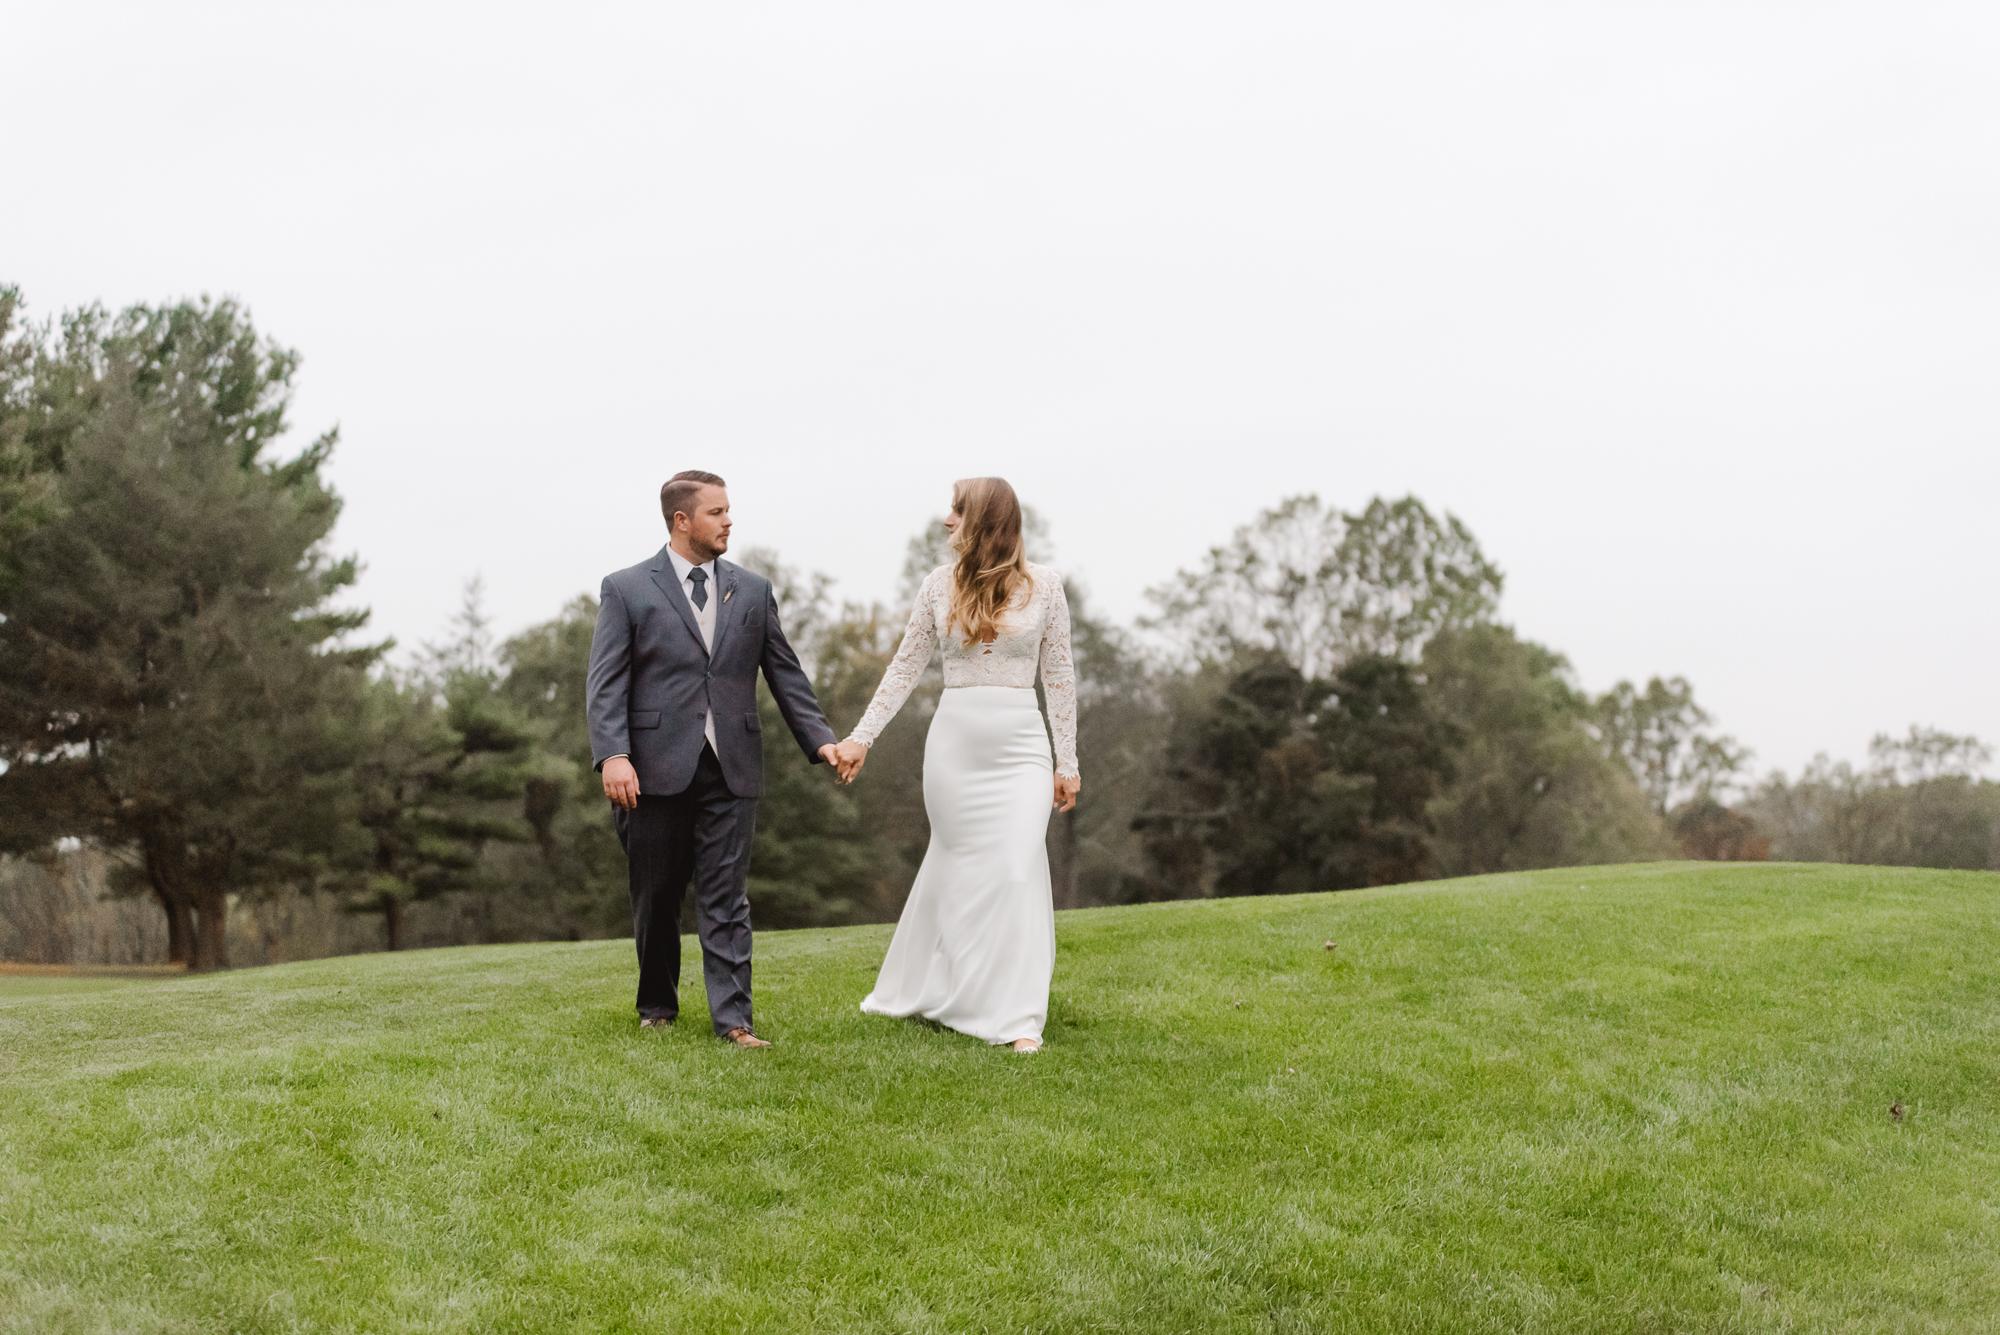 Deerfield-Country-Club-Wedding-DE-Delaware-Peaberry-Photography-PA-NJ-Wedding-Photographer-81.jpg